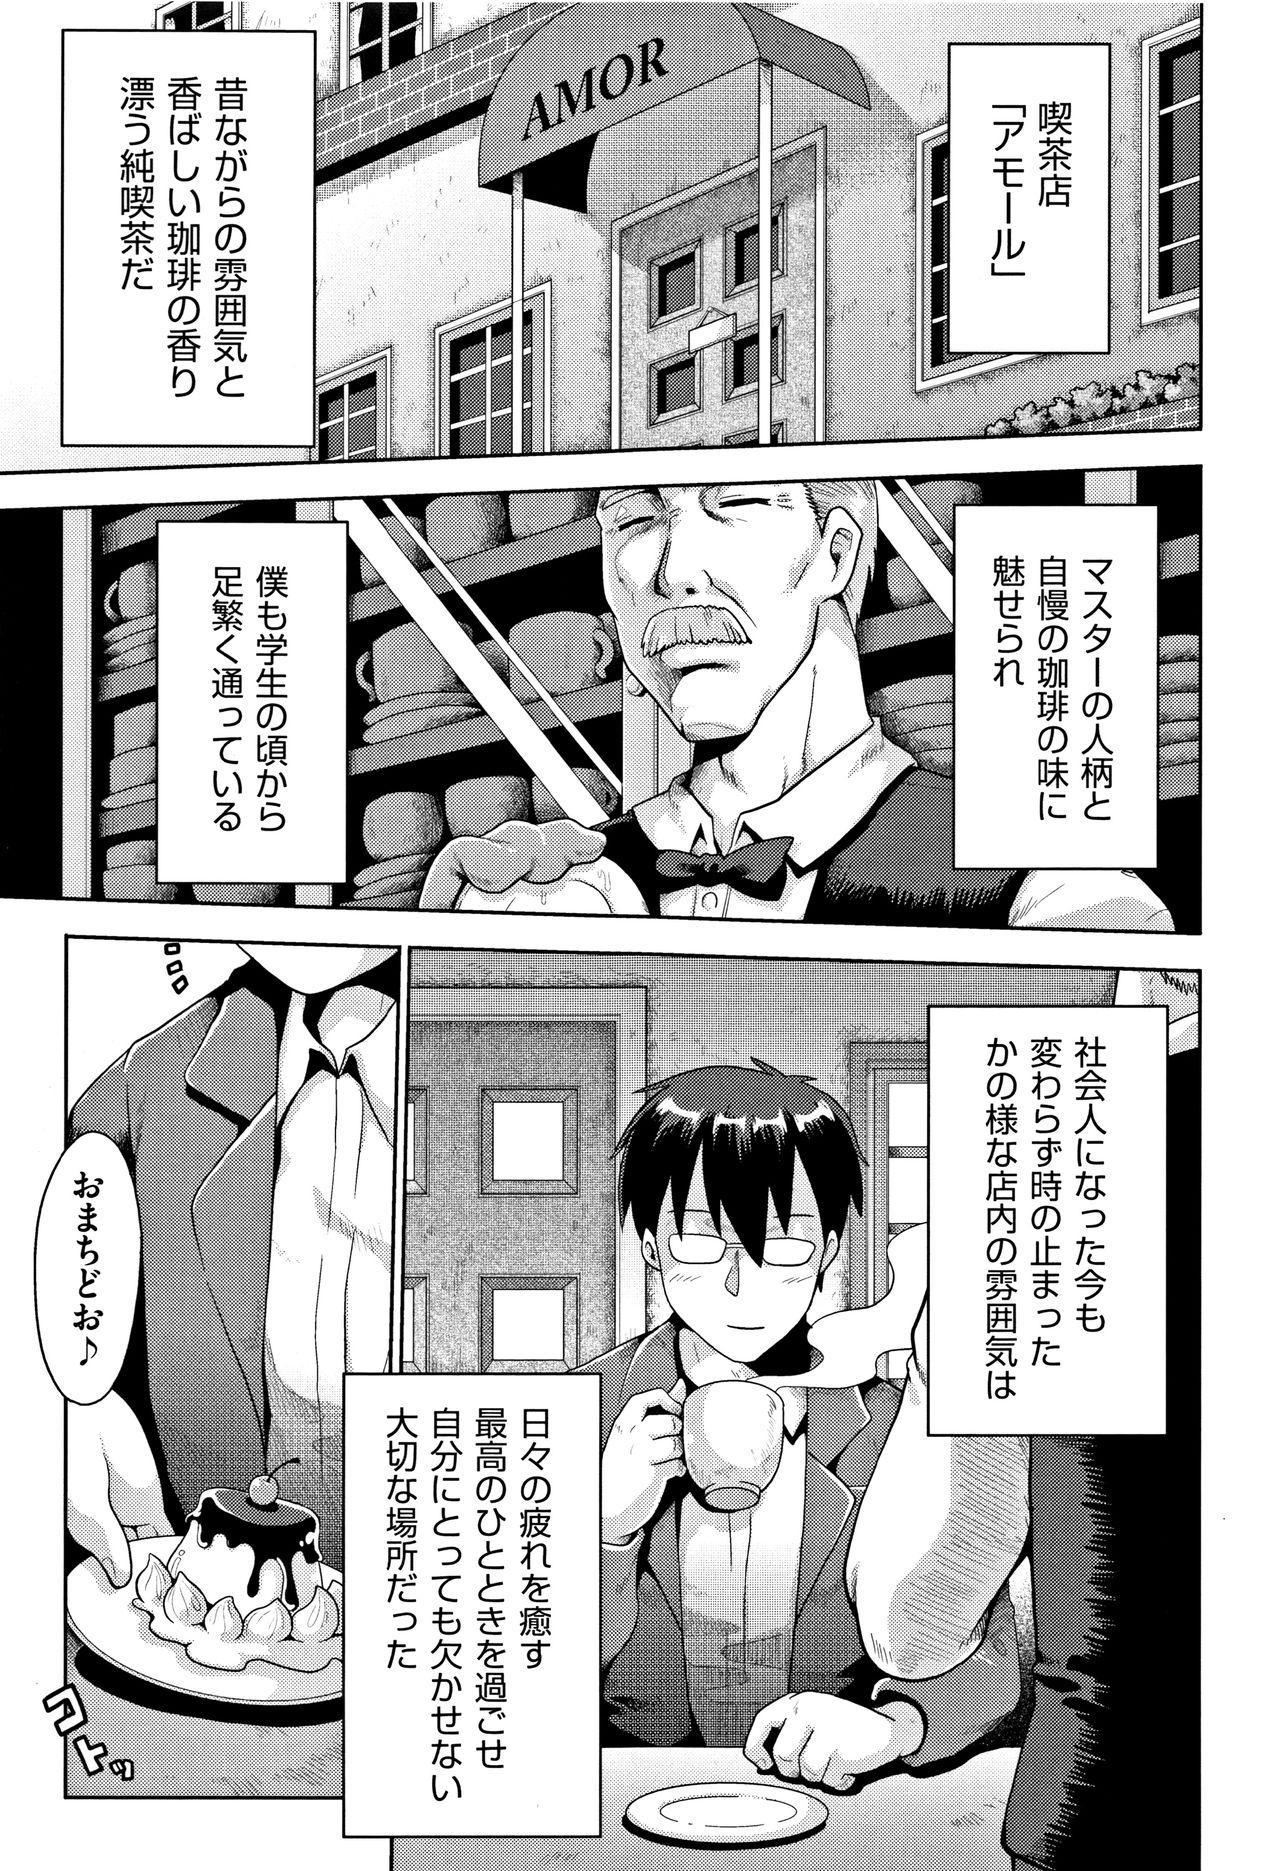 Kokugo Sansuu Rika Sex 169